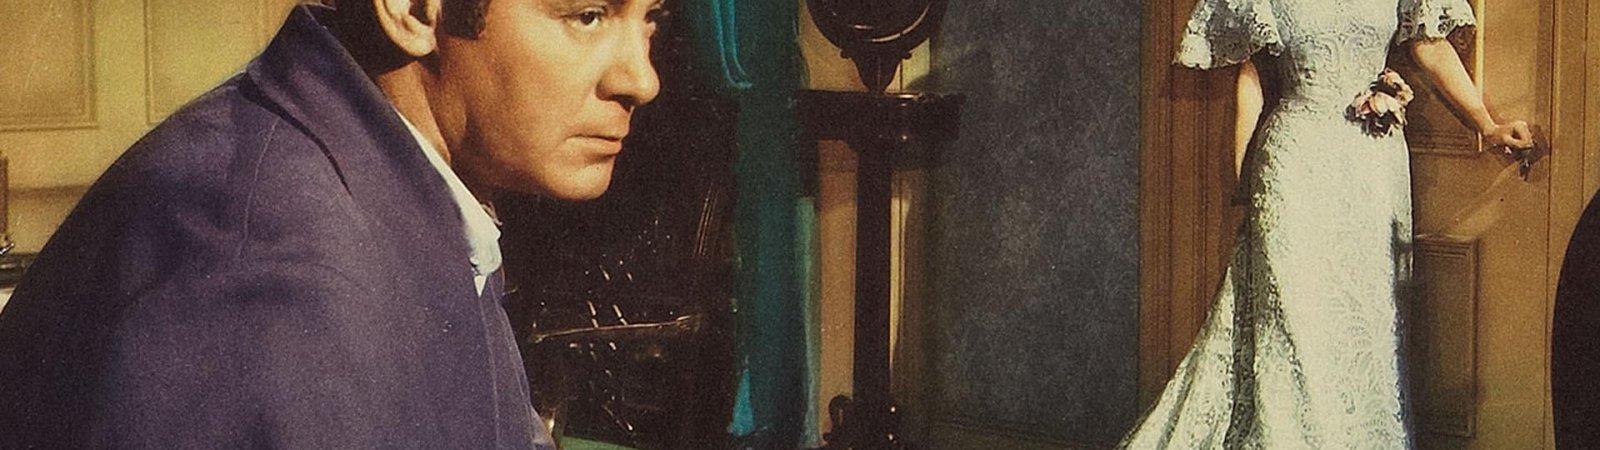 Photo du film : La vipere